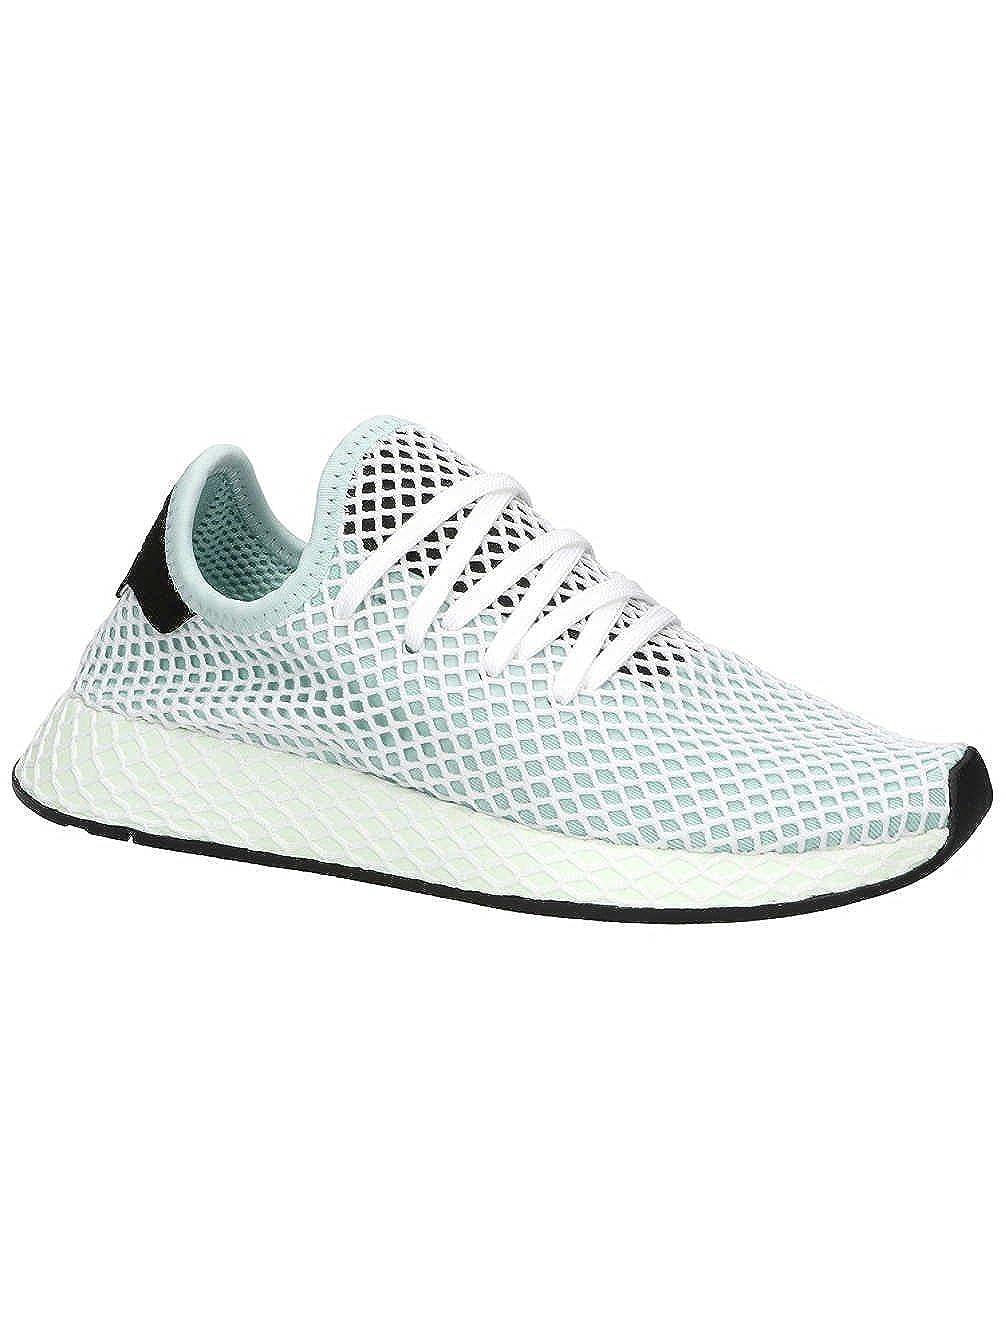 adidas Deerupt Runner BlackMint